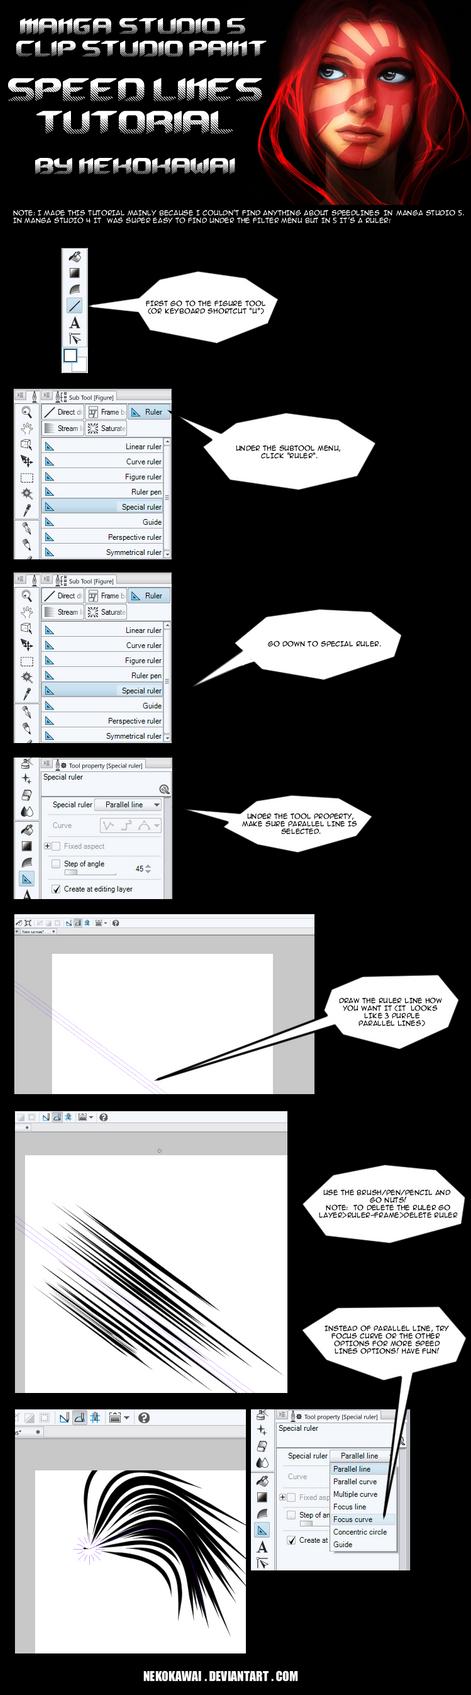 Speedlines tutorial for Manga Studio 5 by nekokawai